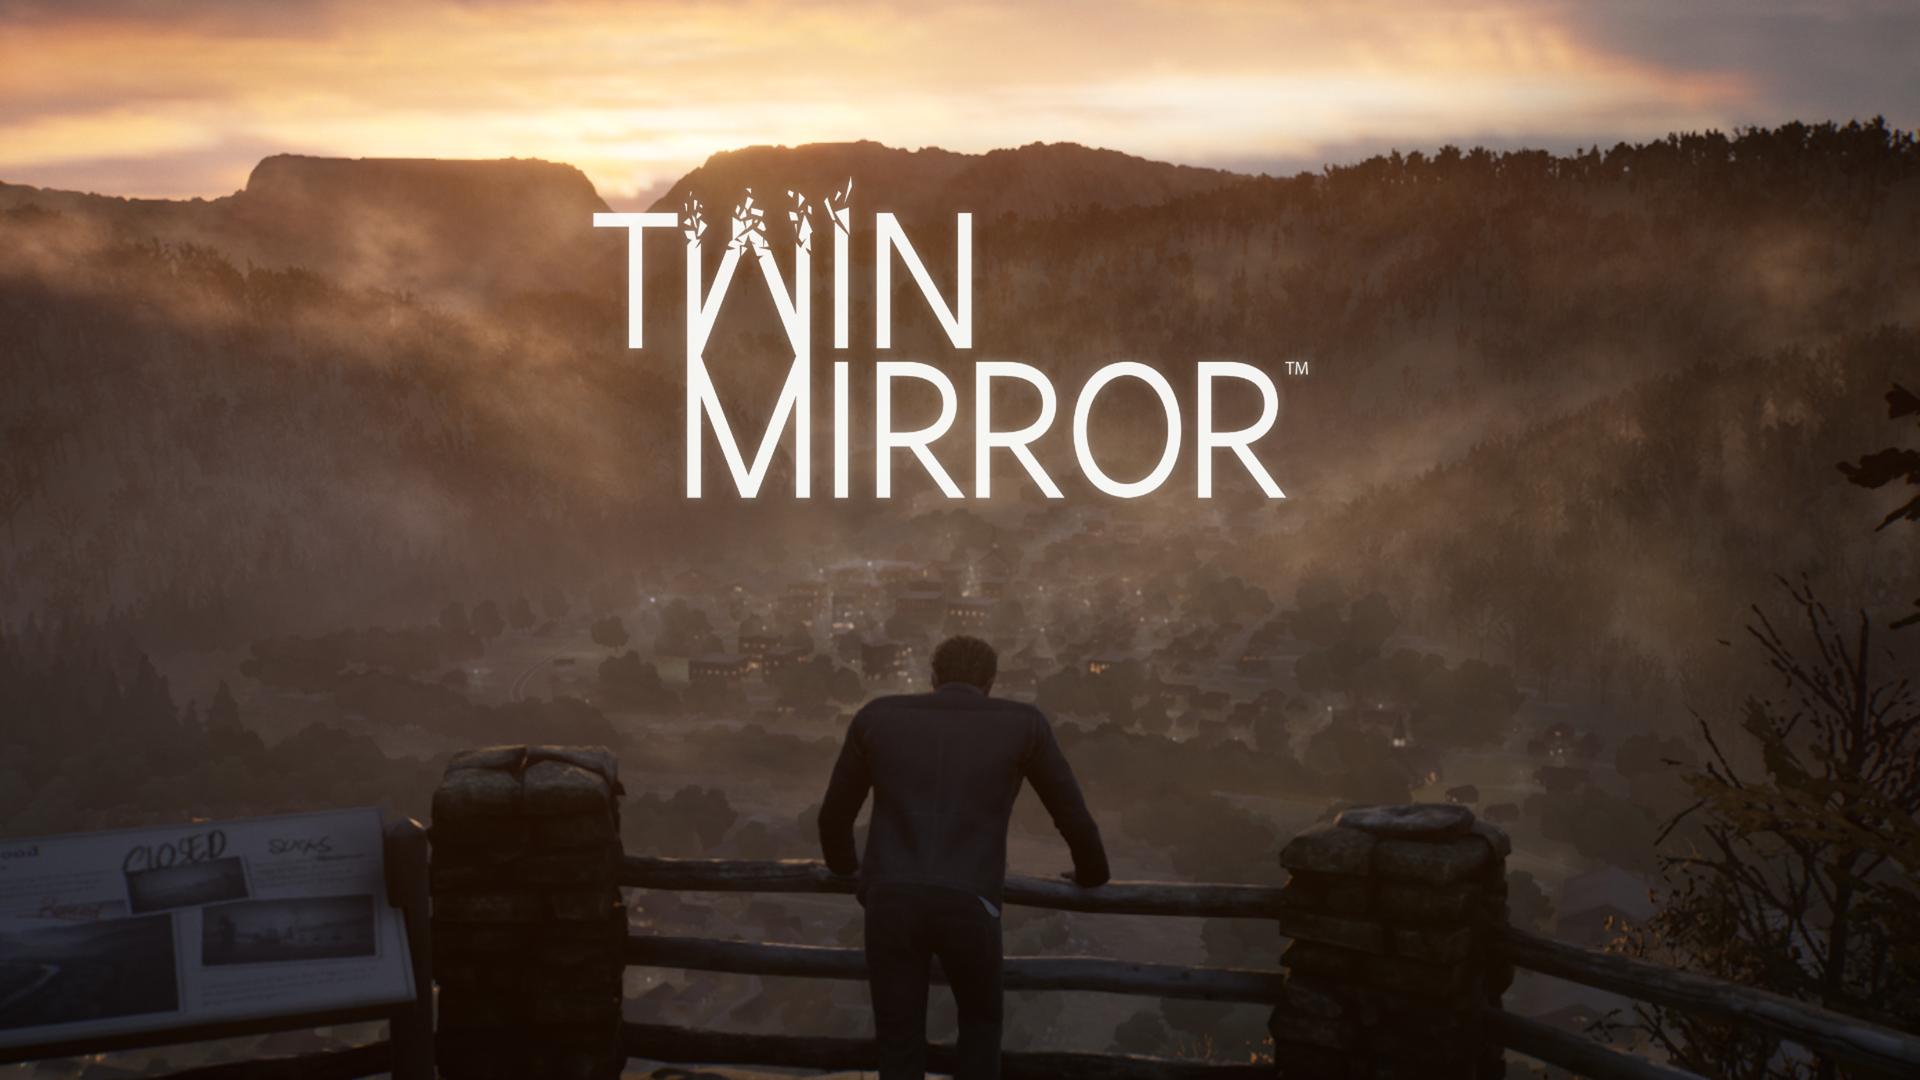 epnwkrfza7_twin-mirror-2021-01-16-15-30-12.png